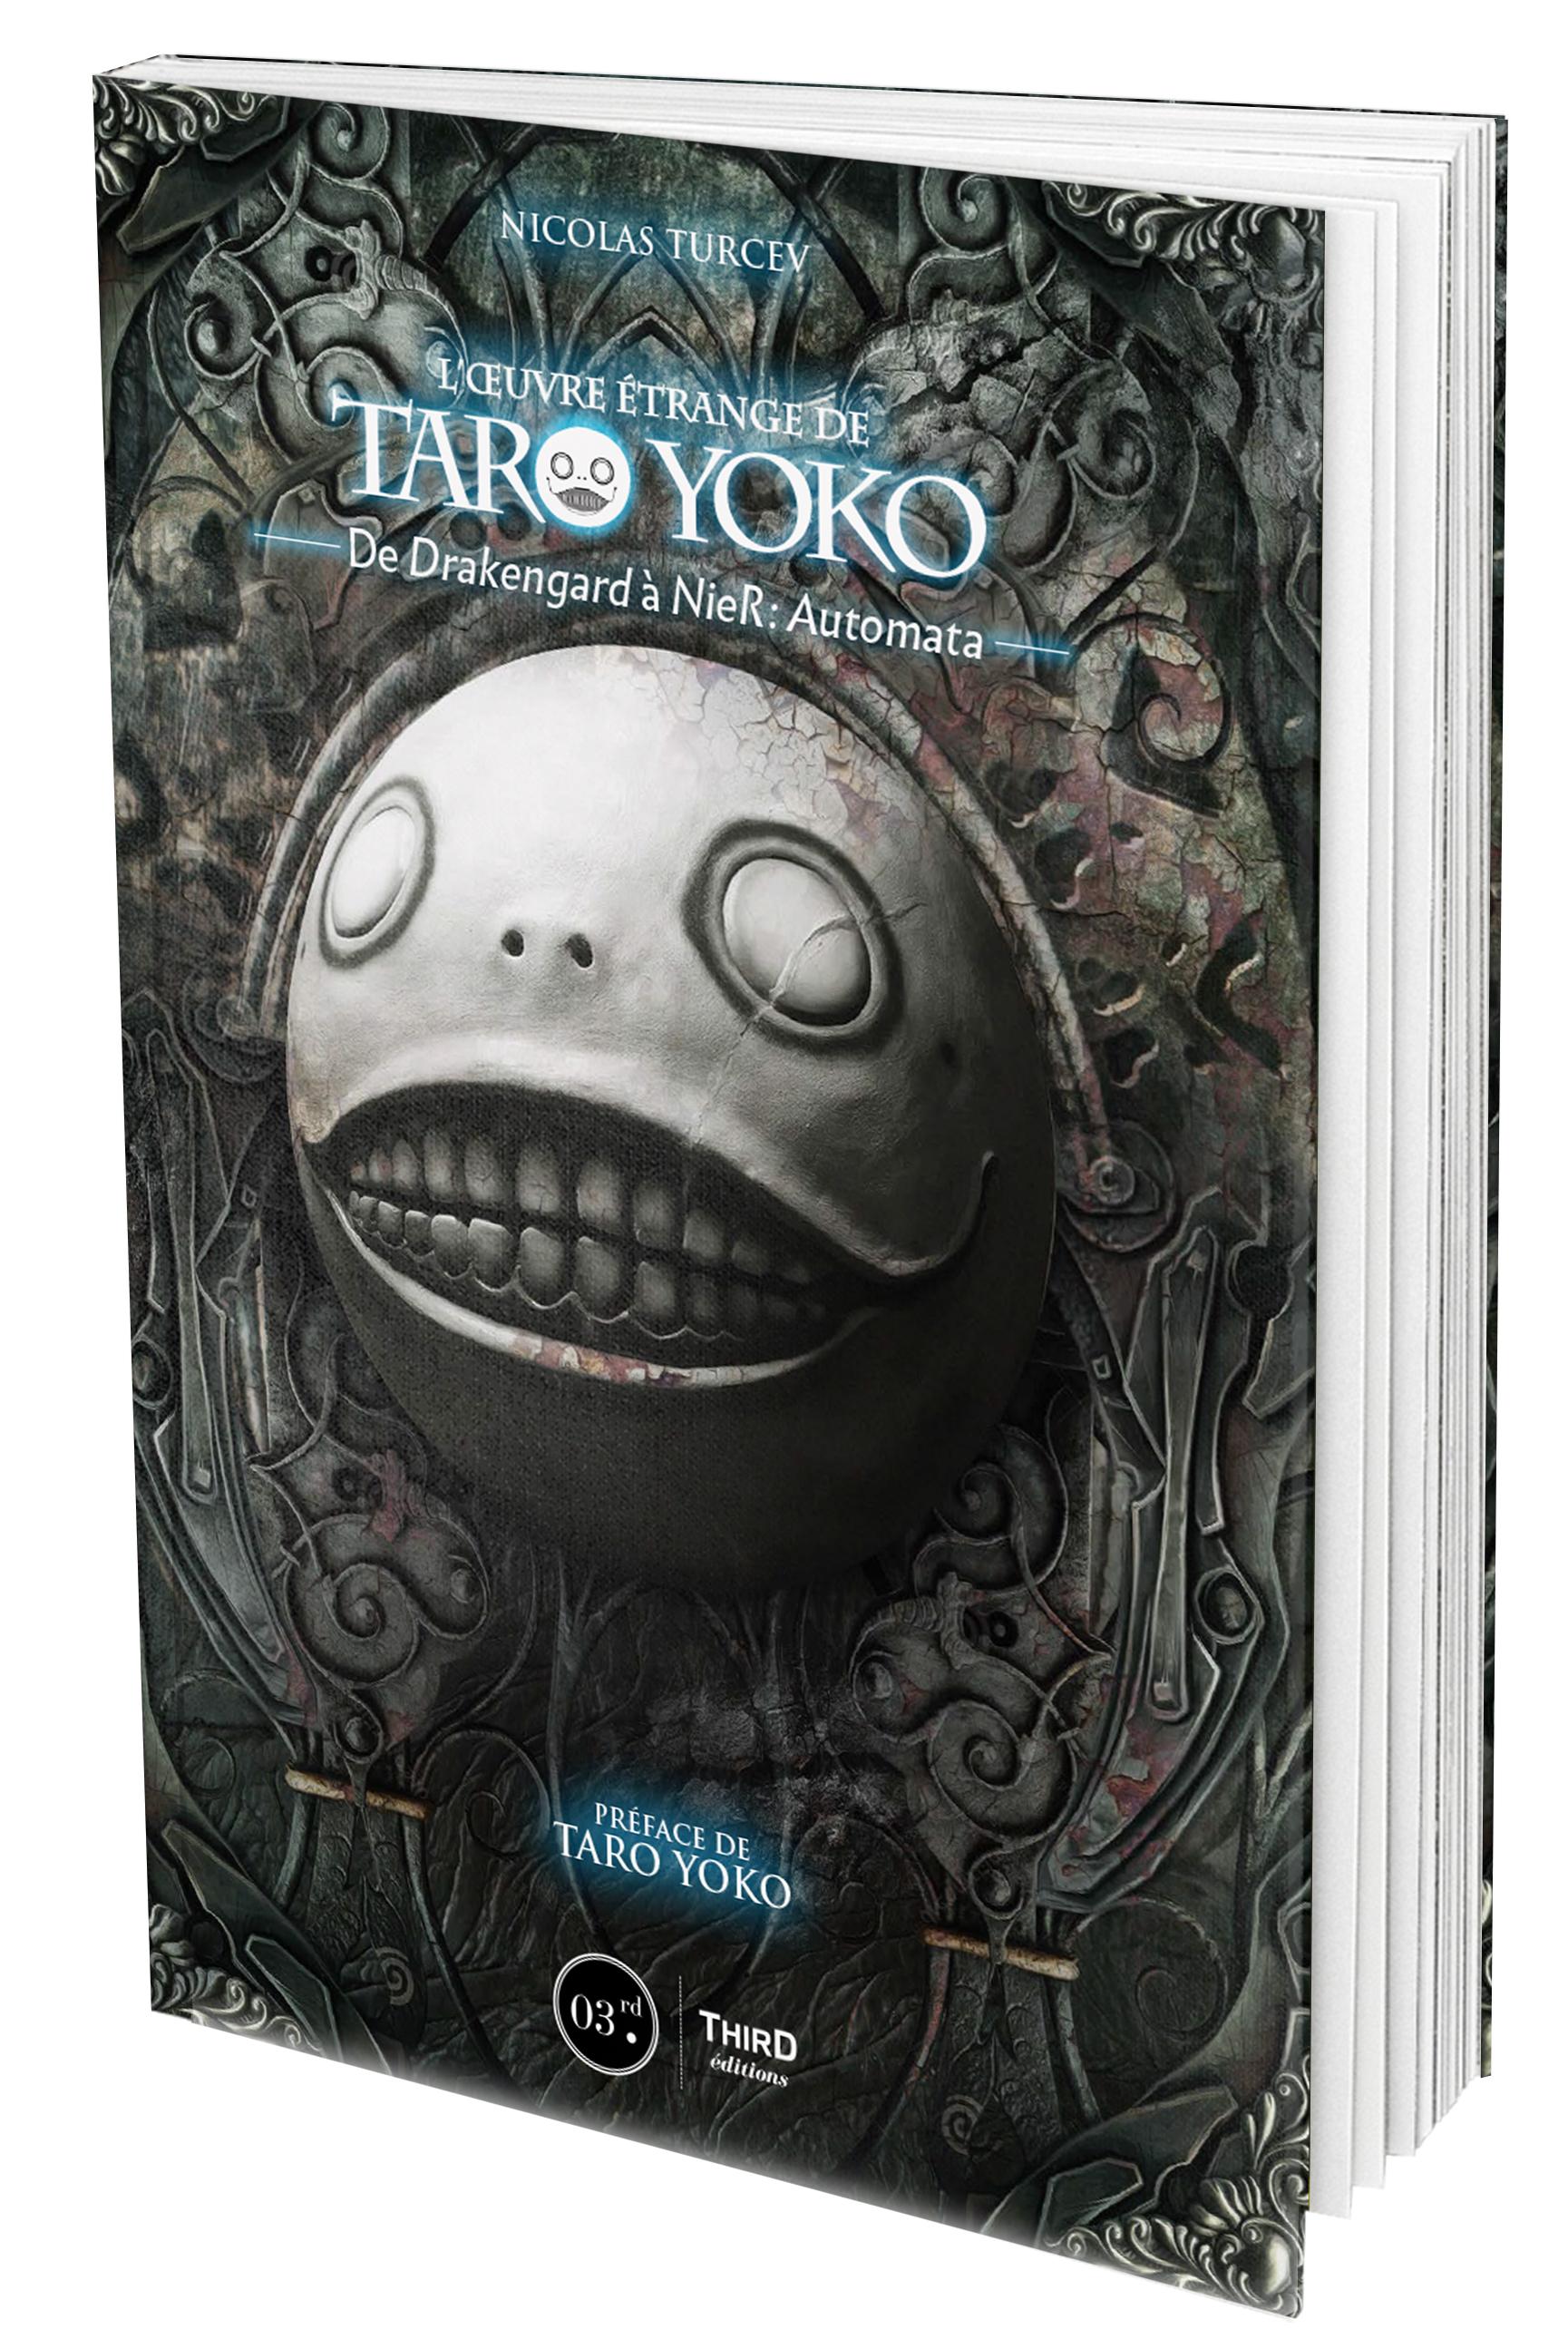 L'Œuvre Étrange de Taro Yoko, de Drakengard à NieR Automata 1520758073-7097-artwork